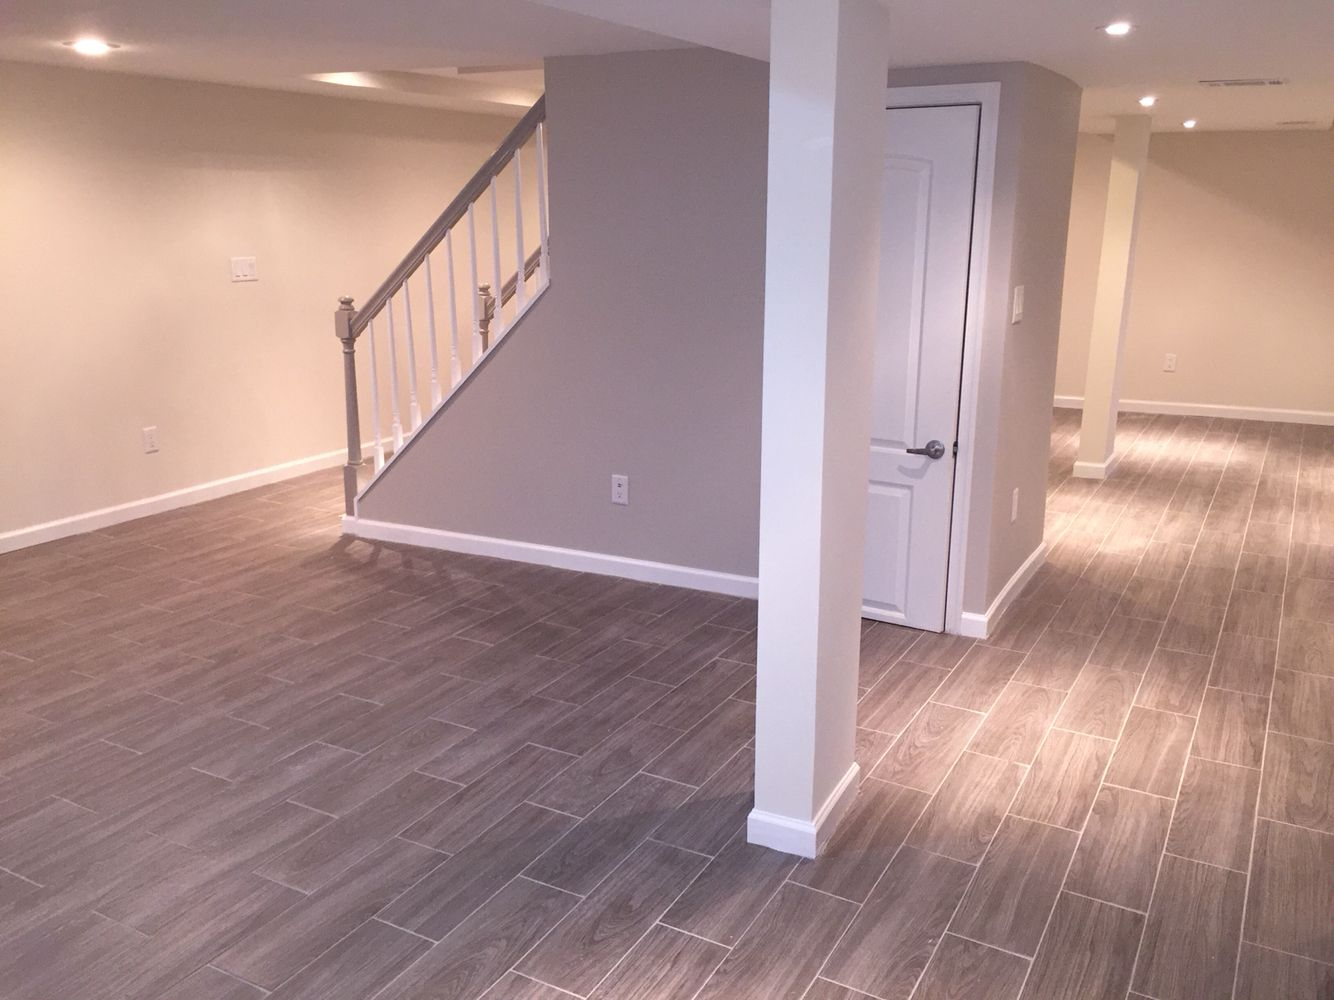 Loving Basement Modern Clean Shades Grey Wood Tile Sherwin Williams Paint